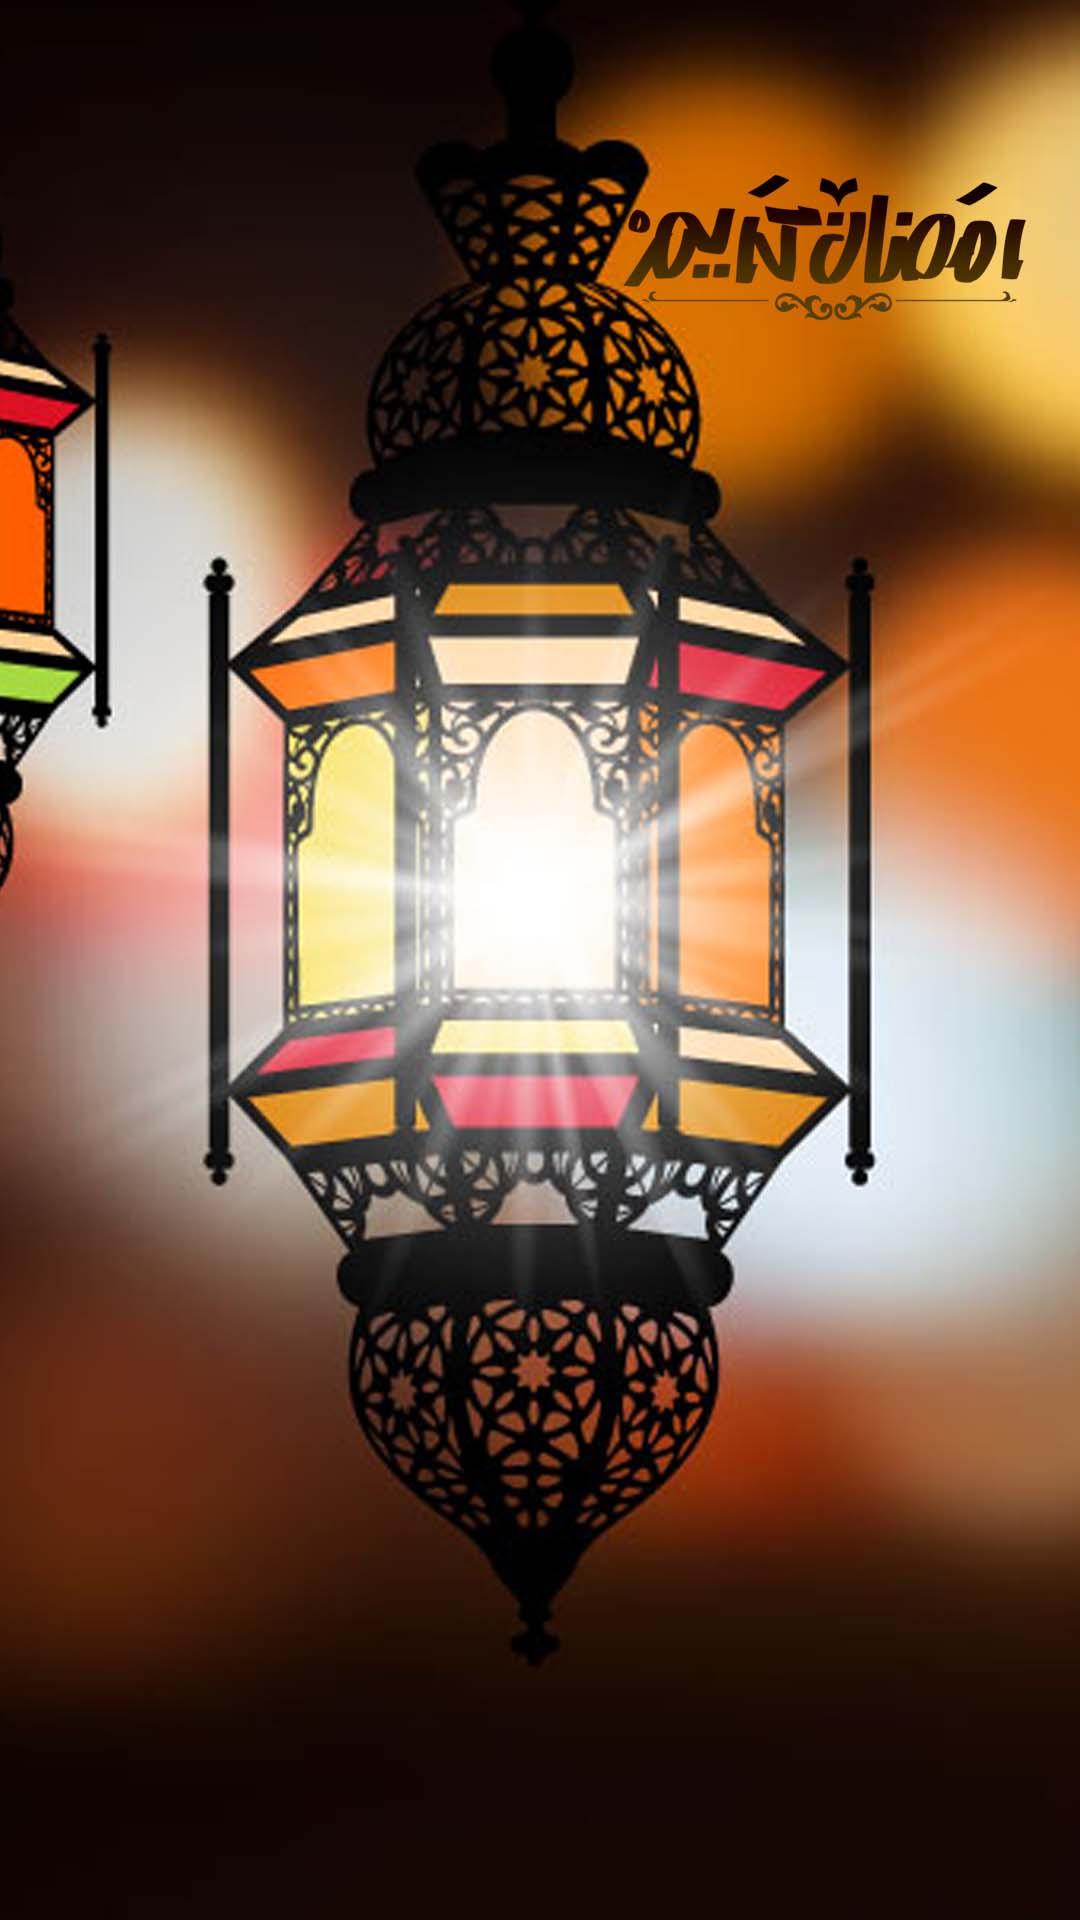 خلفيات موبايل رمضان كريم Mobile Wallpapers HD 15 خلفيات موبايل رمضان كريم Mobile Wallpapers HD